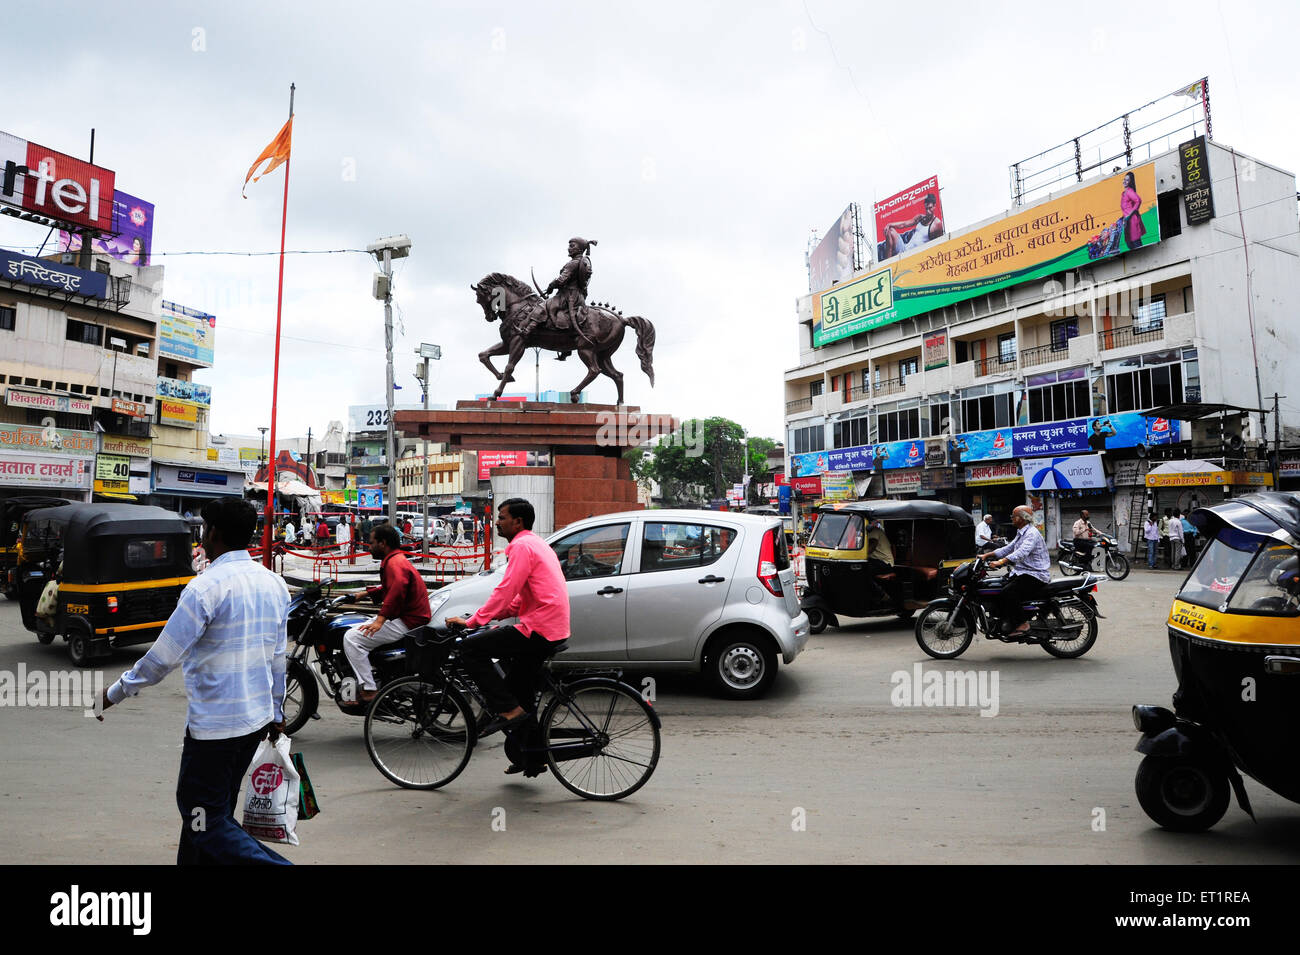 Panjarpola carrefour et statue de Shivaji Maharaj;;; Inde Maharashtra Mumbai Photo Stock